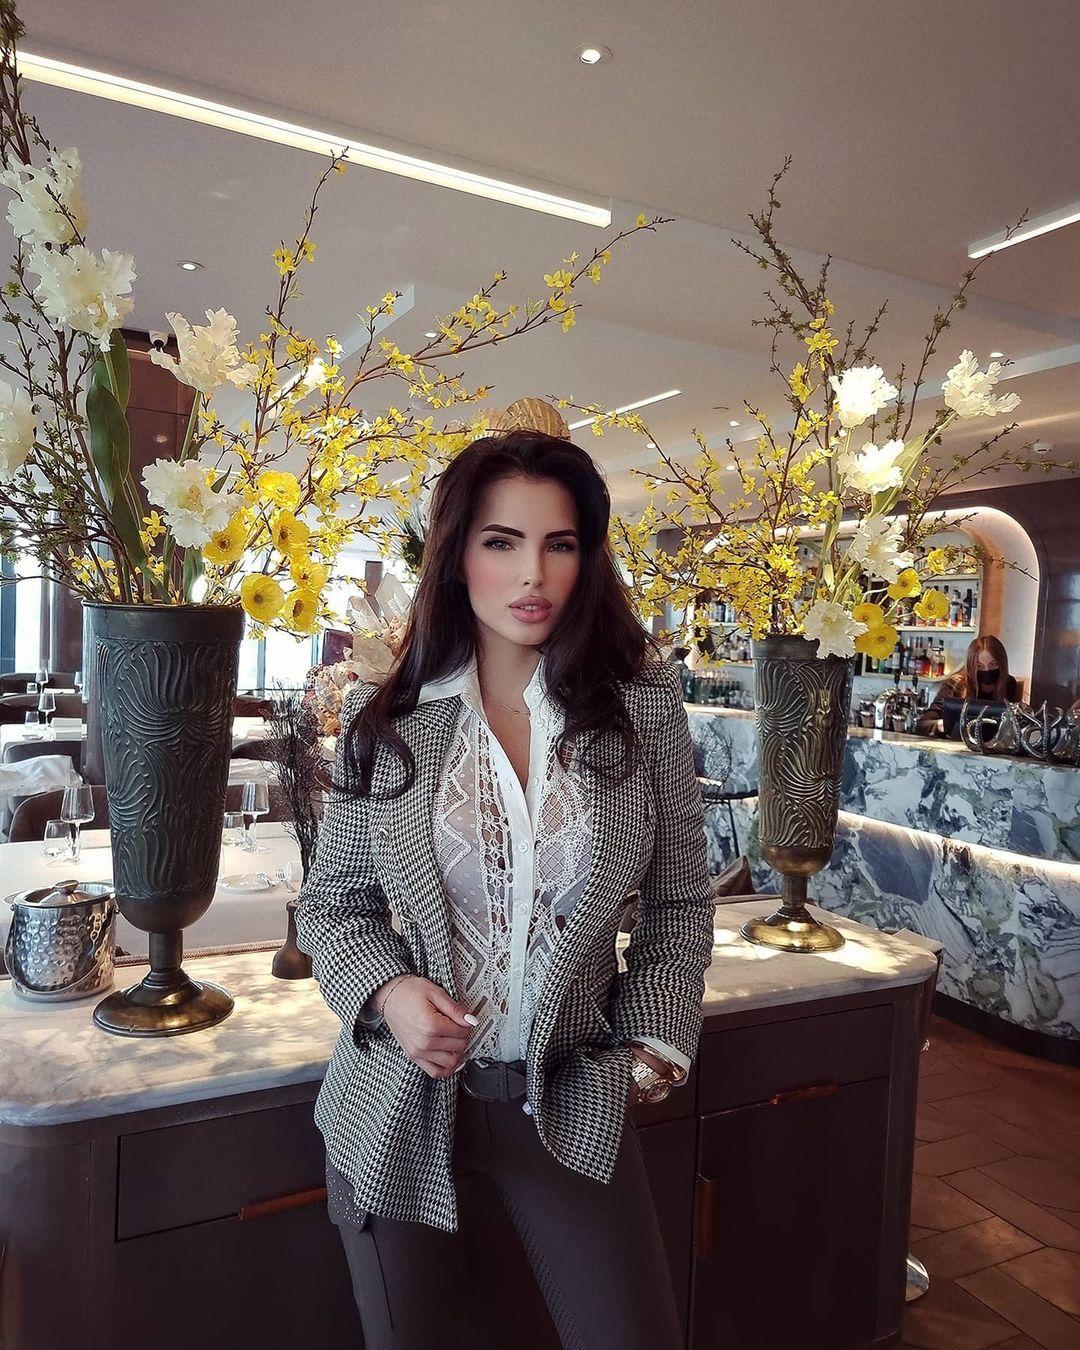 Elizaveta-Berejnaya-Wallpapers-Insta-Fit-Bio-Miss-elizabeth-sol-Wallpapers-Insta-Fit-Bio-5